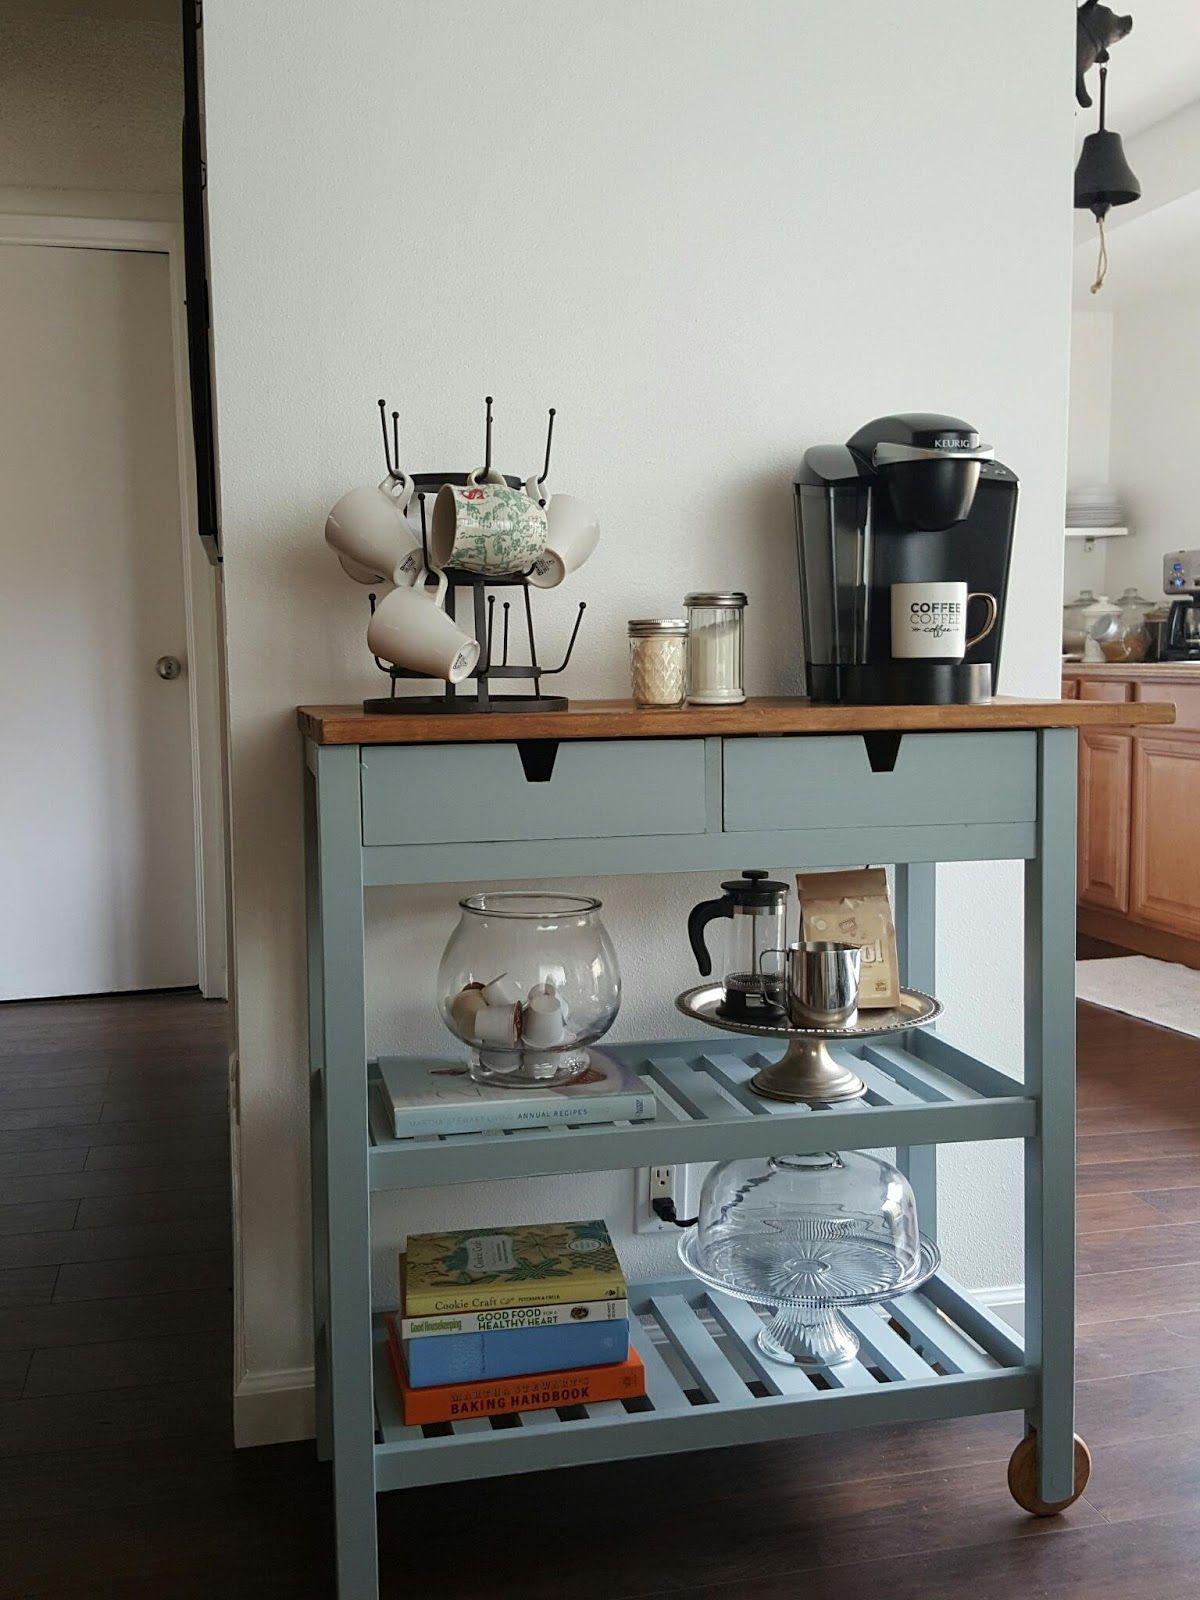 Charmed Crown Blog: DIY Ikea Coffee Cart | new dorm | Aparador ...